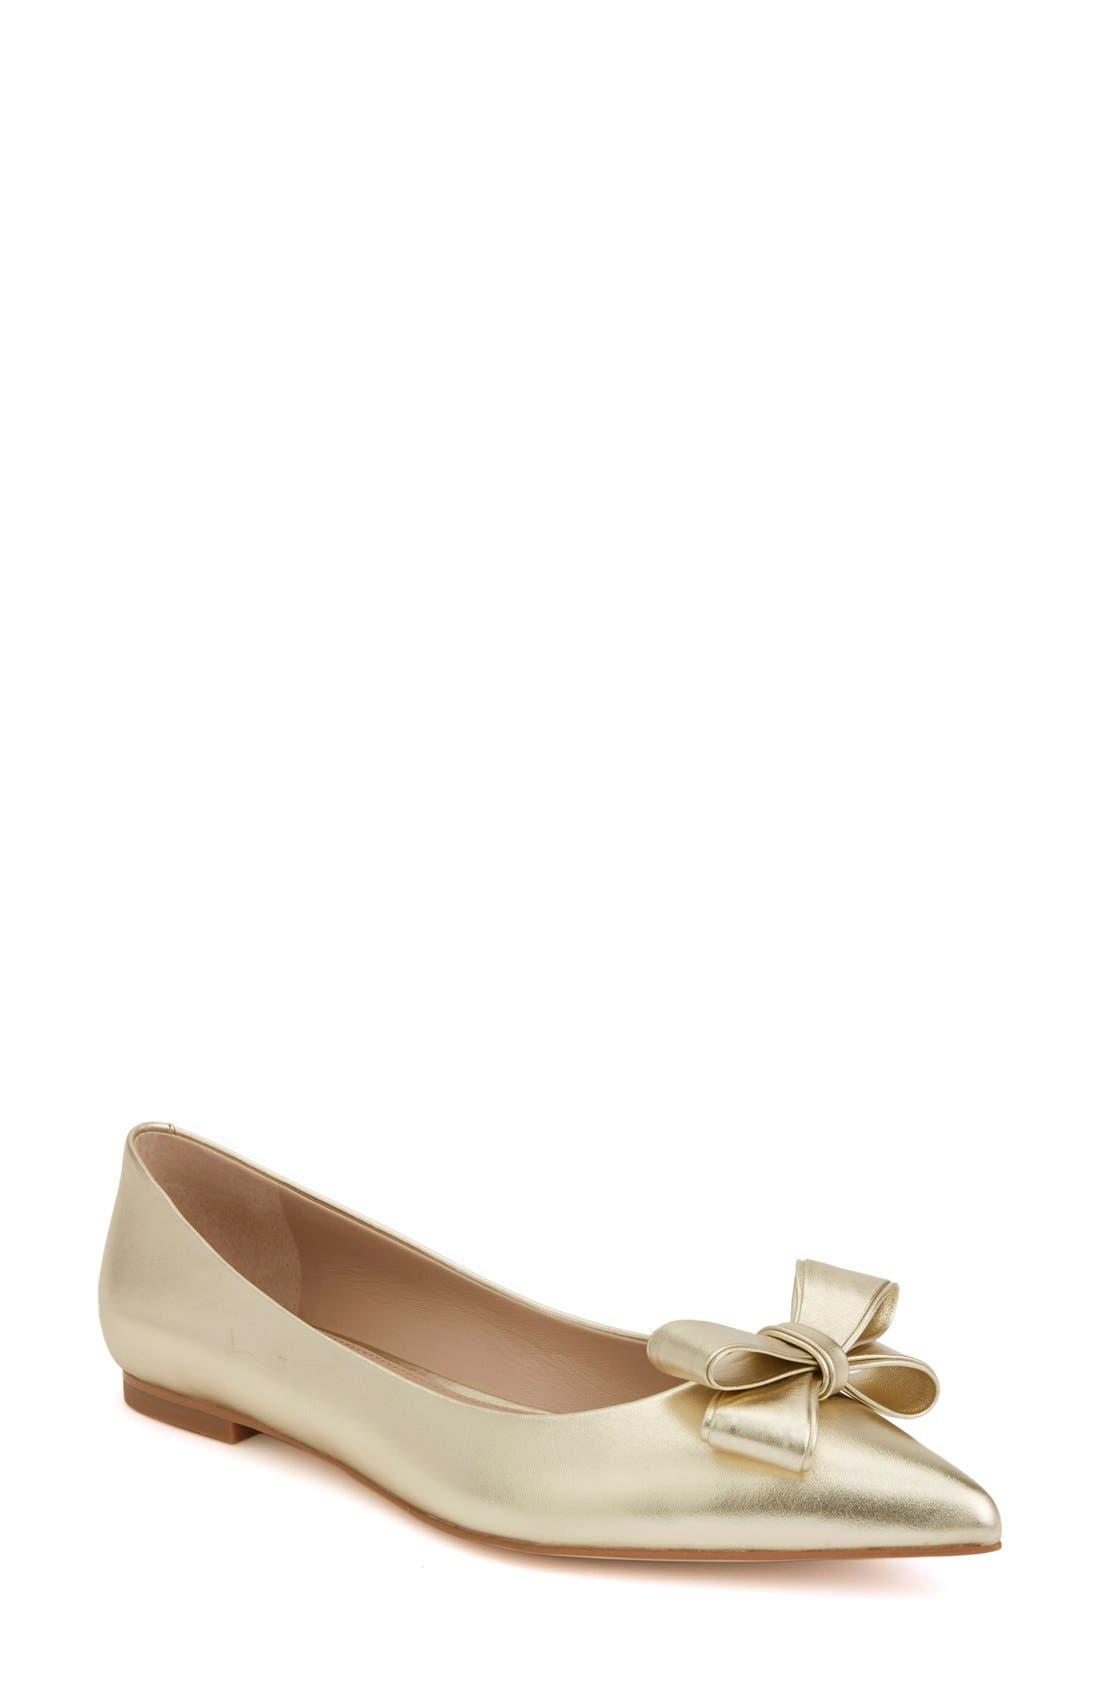 Shoes of Prey x Megan Hess Bow Flat (Women)